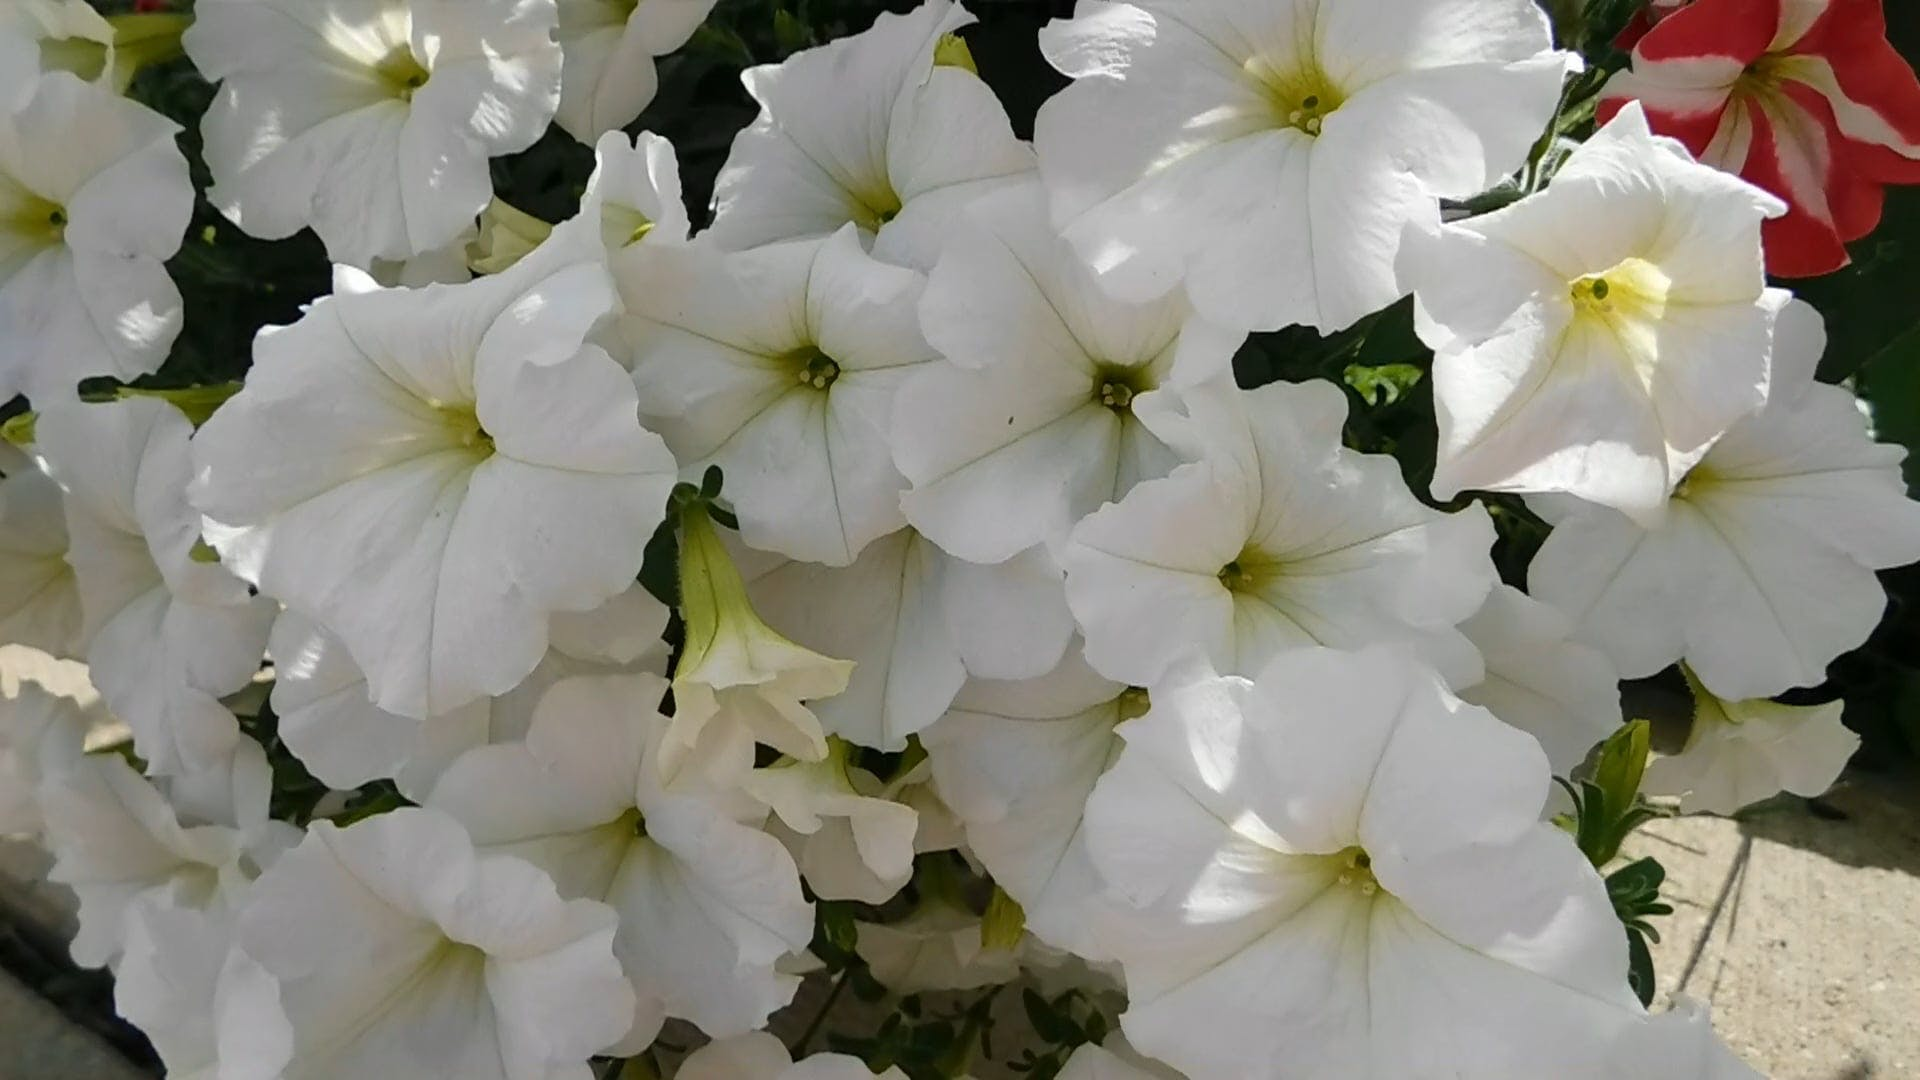 White Petunias In Bloom